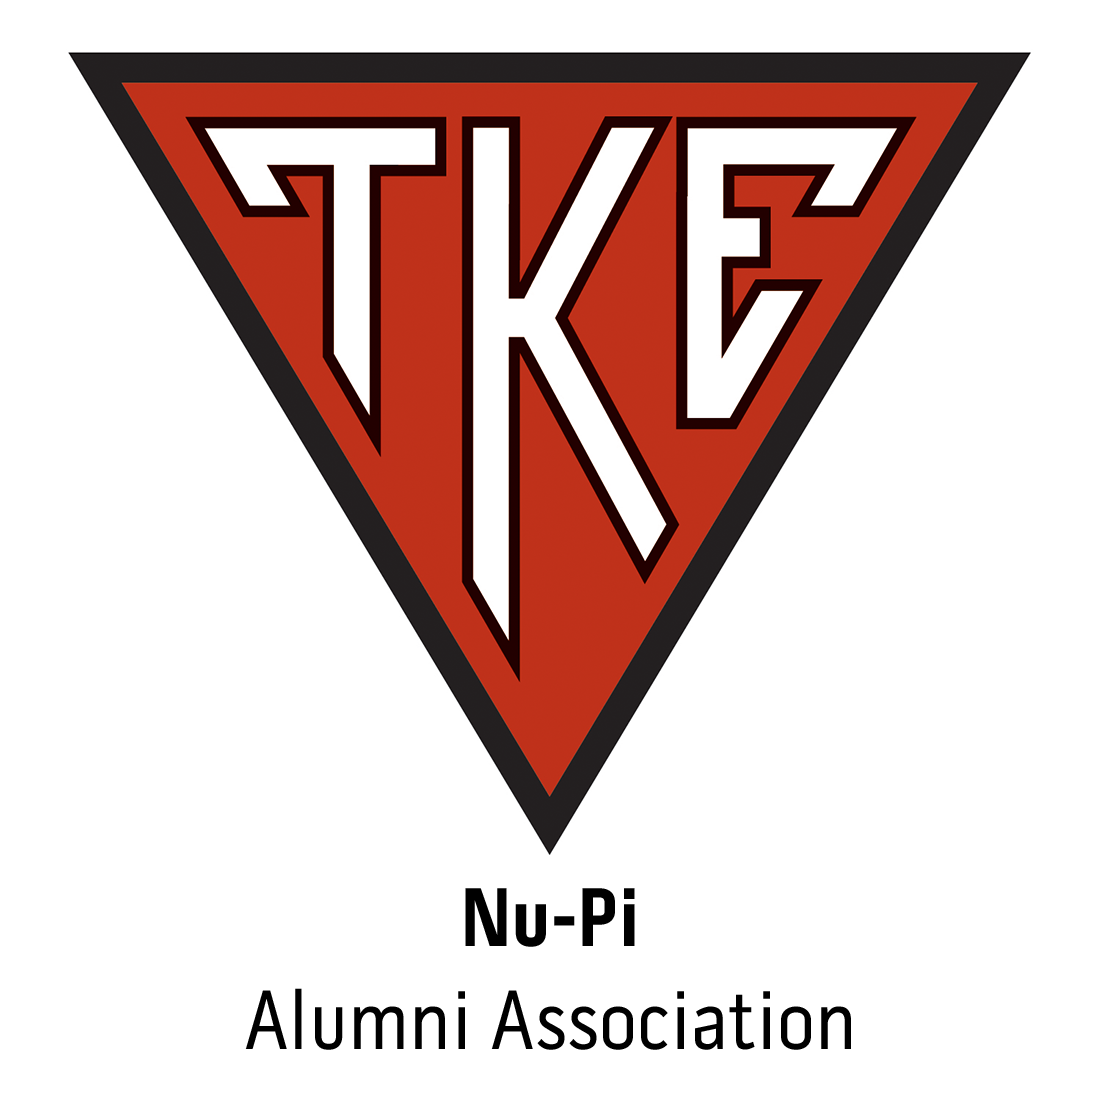 Nu-Pi Alumni Association at University of Delaware